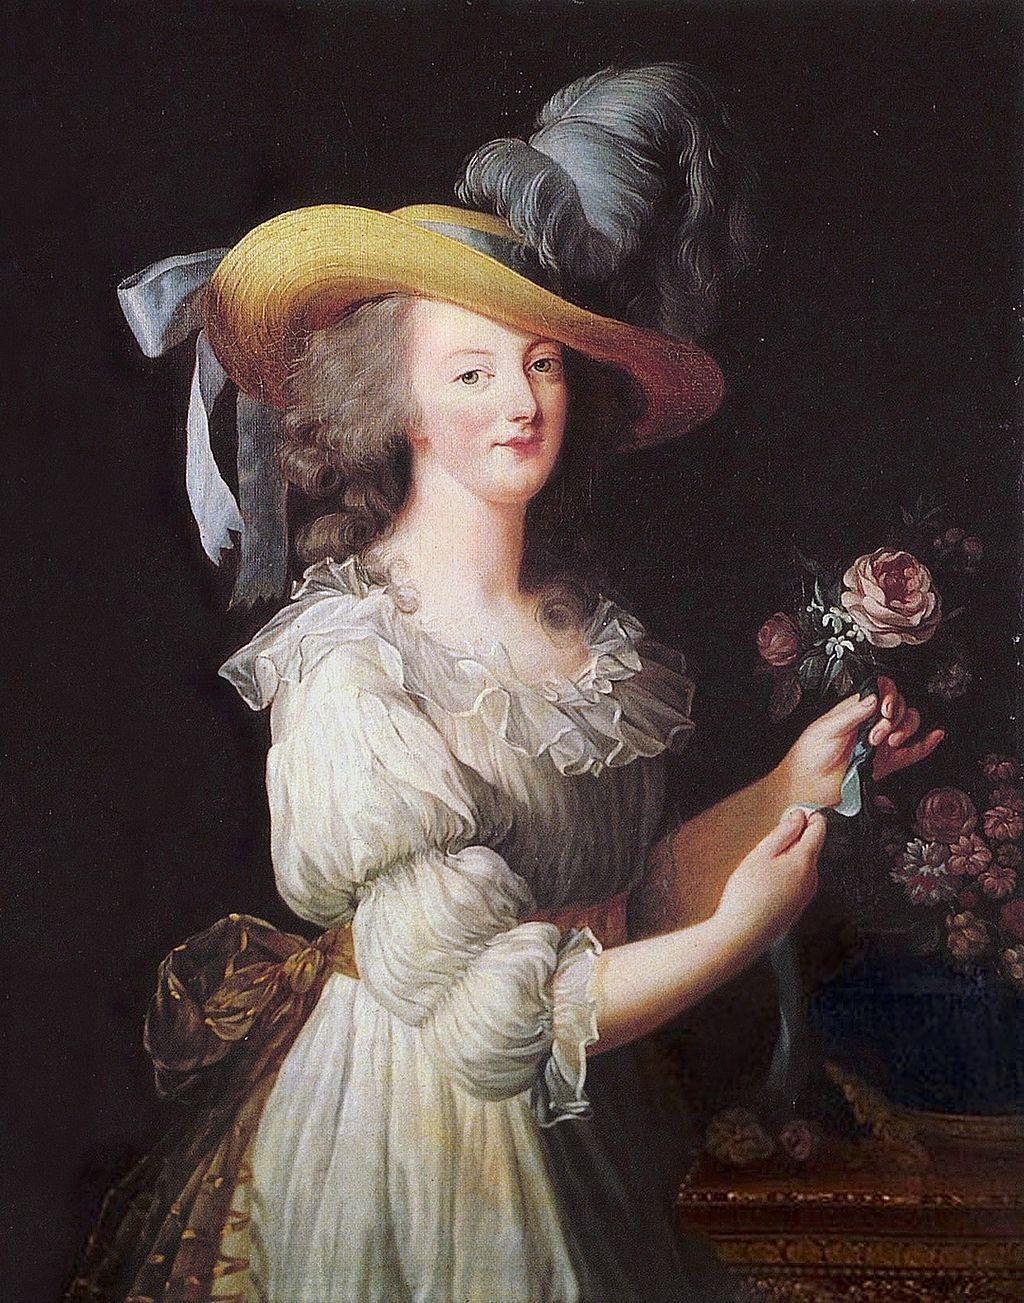 Vigée Le Brun, Élisabeth (1755-1842)